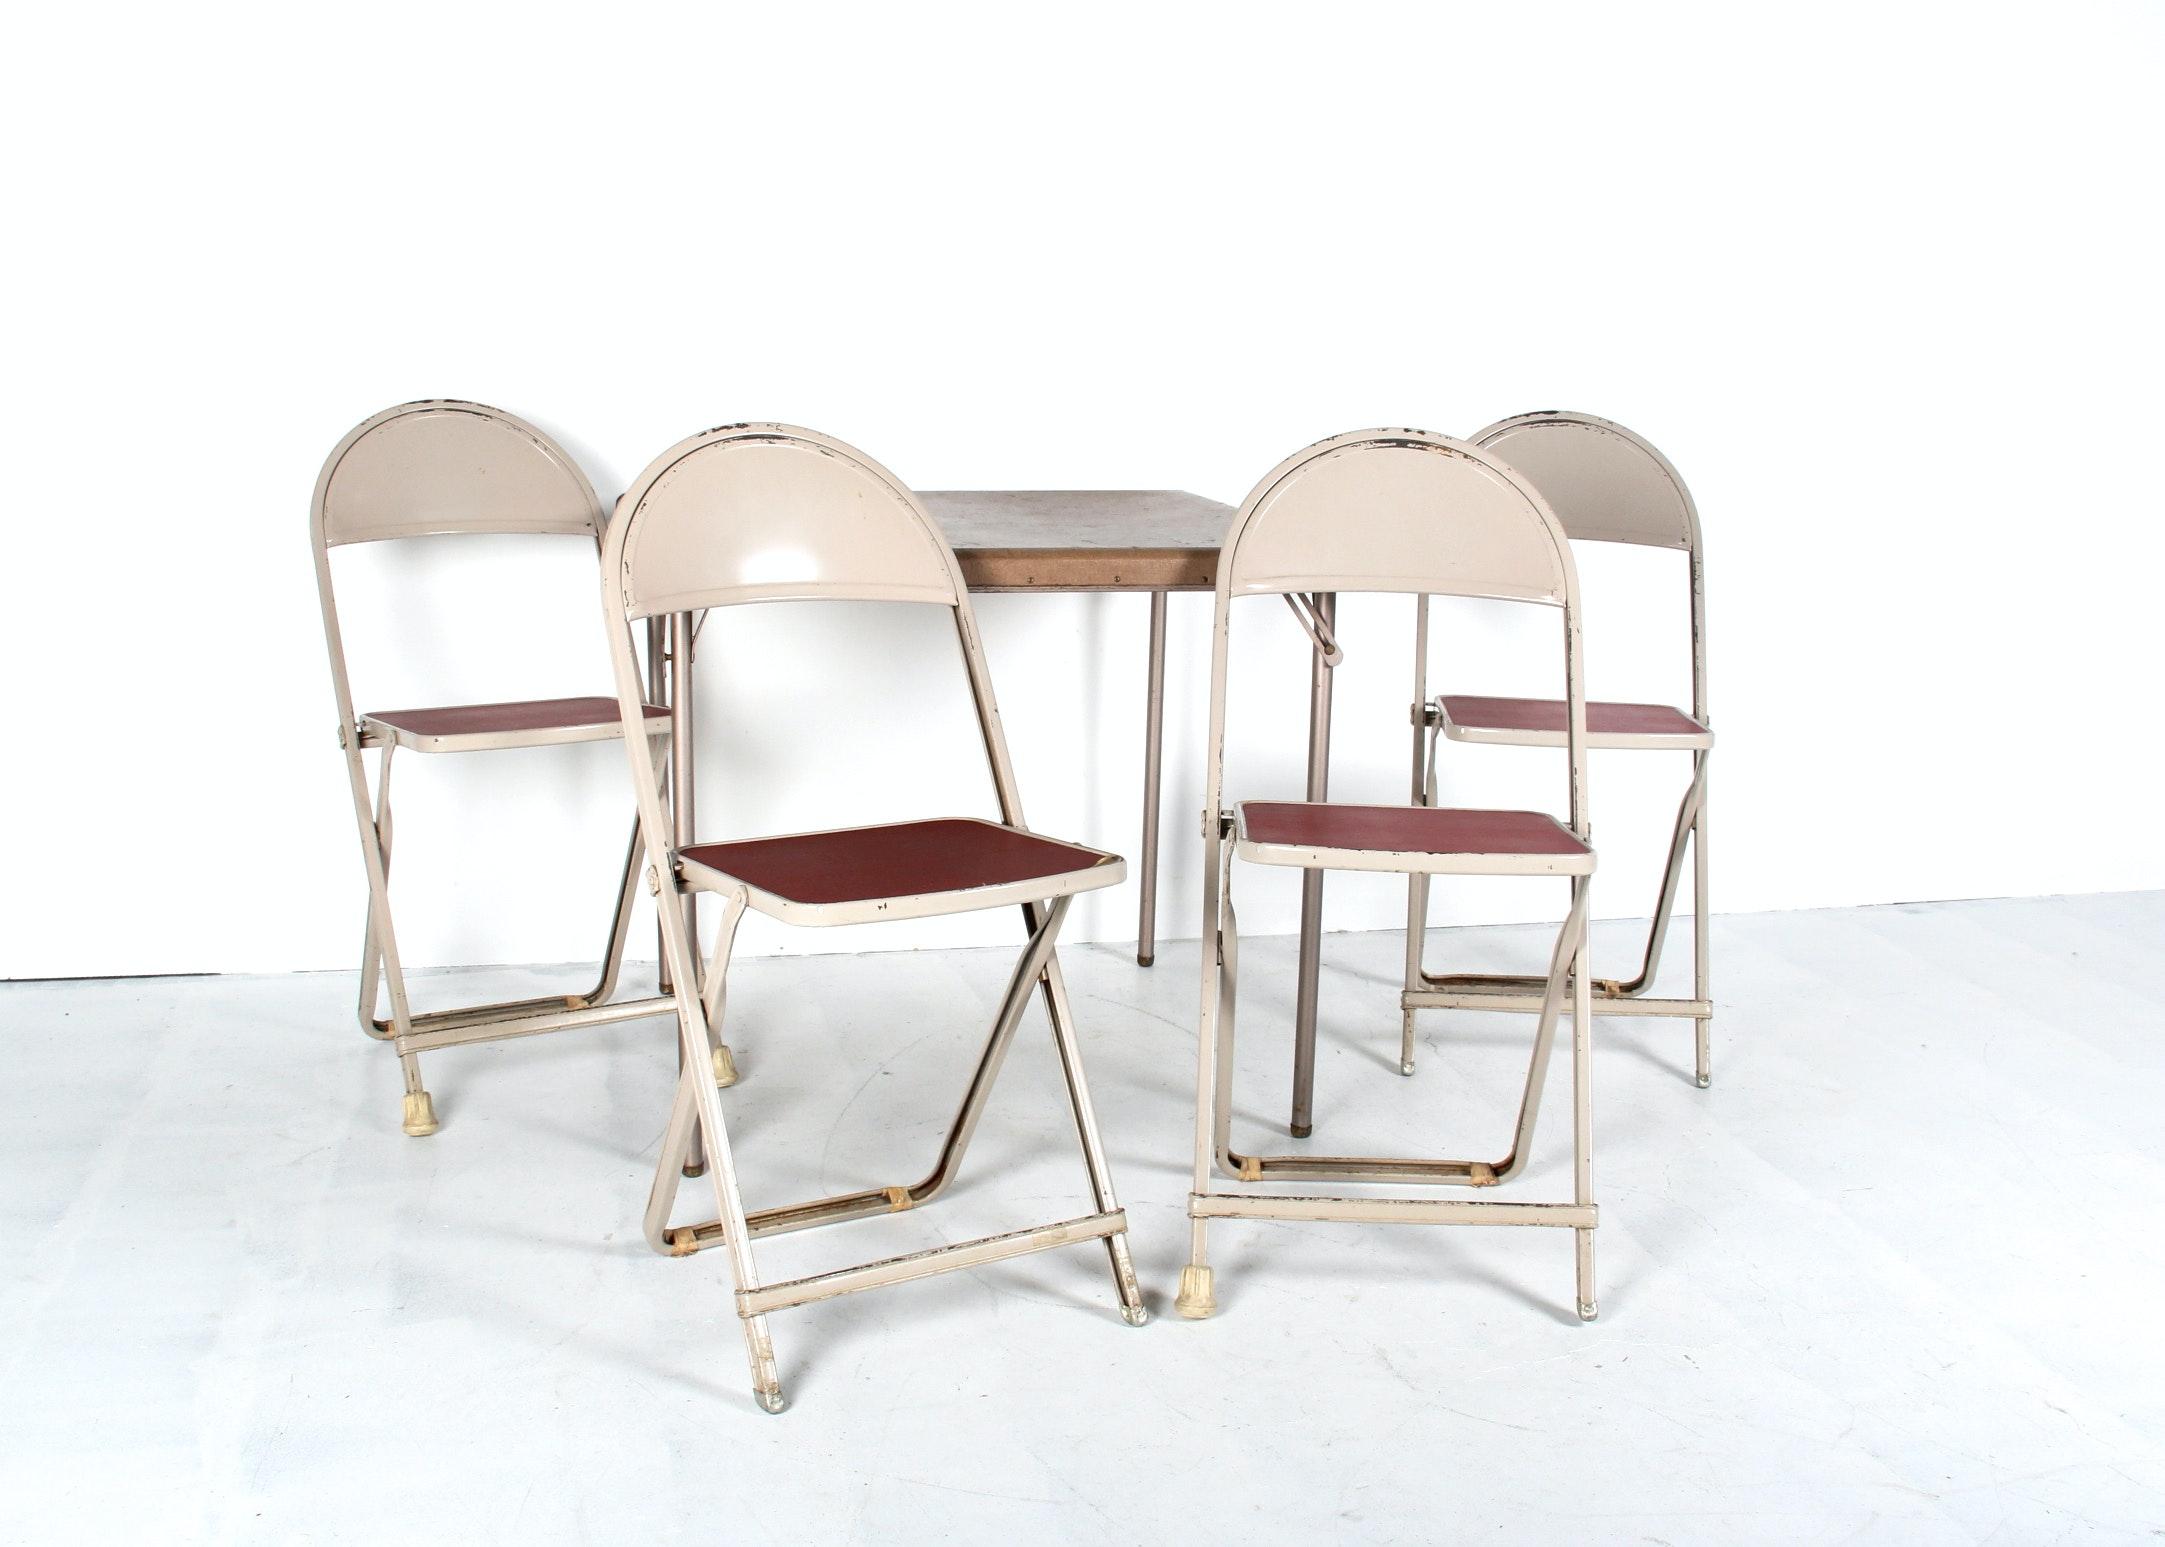 Vintage Samsonite Folding Table and Four Chair Set EBTH